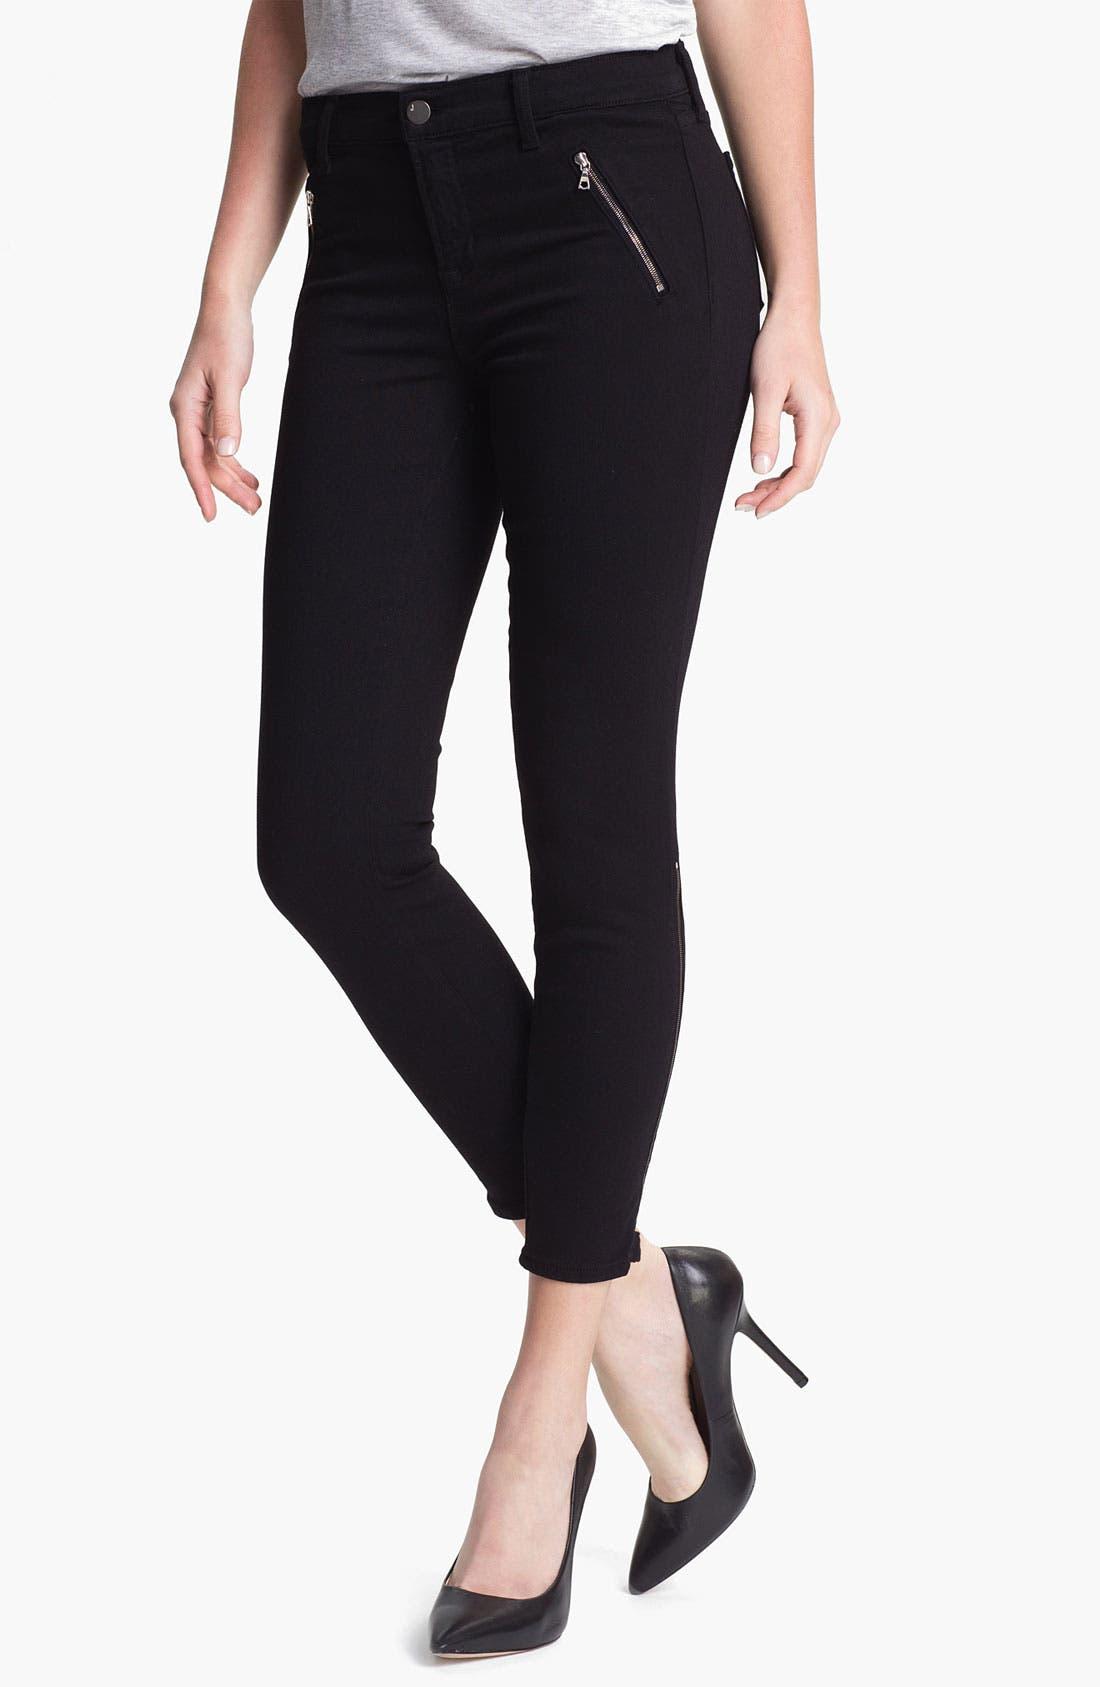 Alternate Image 1 Selected - J Brand 'Carey' Zip Detail Moto Skinny Jeans (Black)